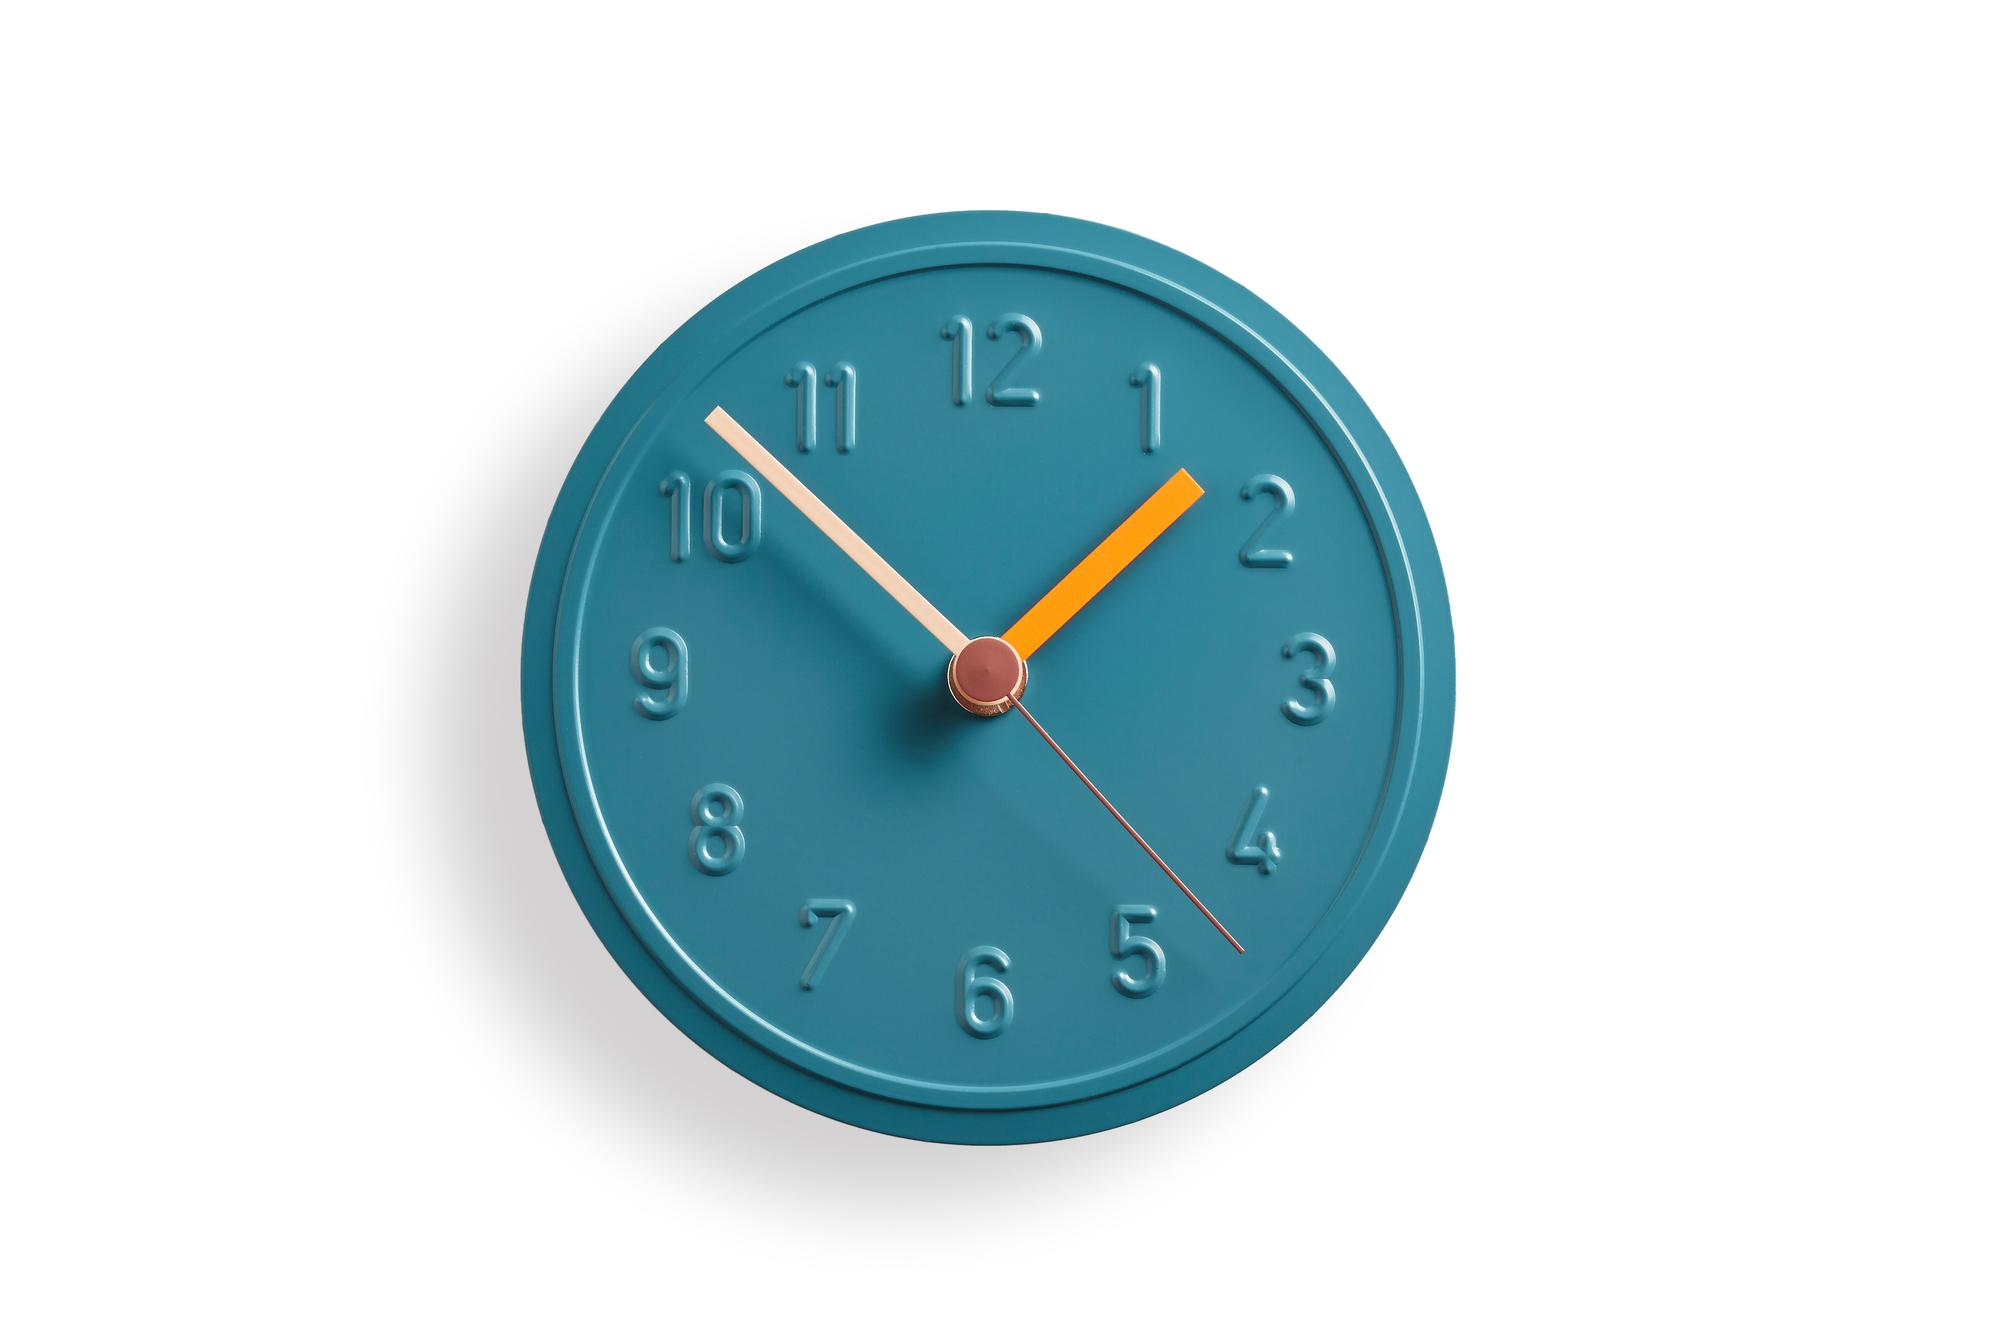 Alu Alu Wall Clock Verdigris Richard Lampert